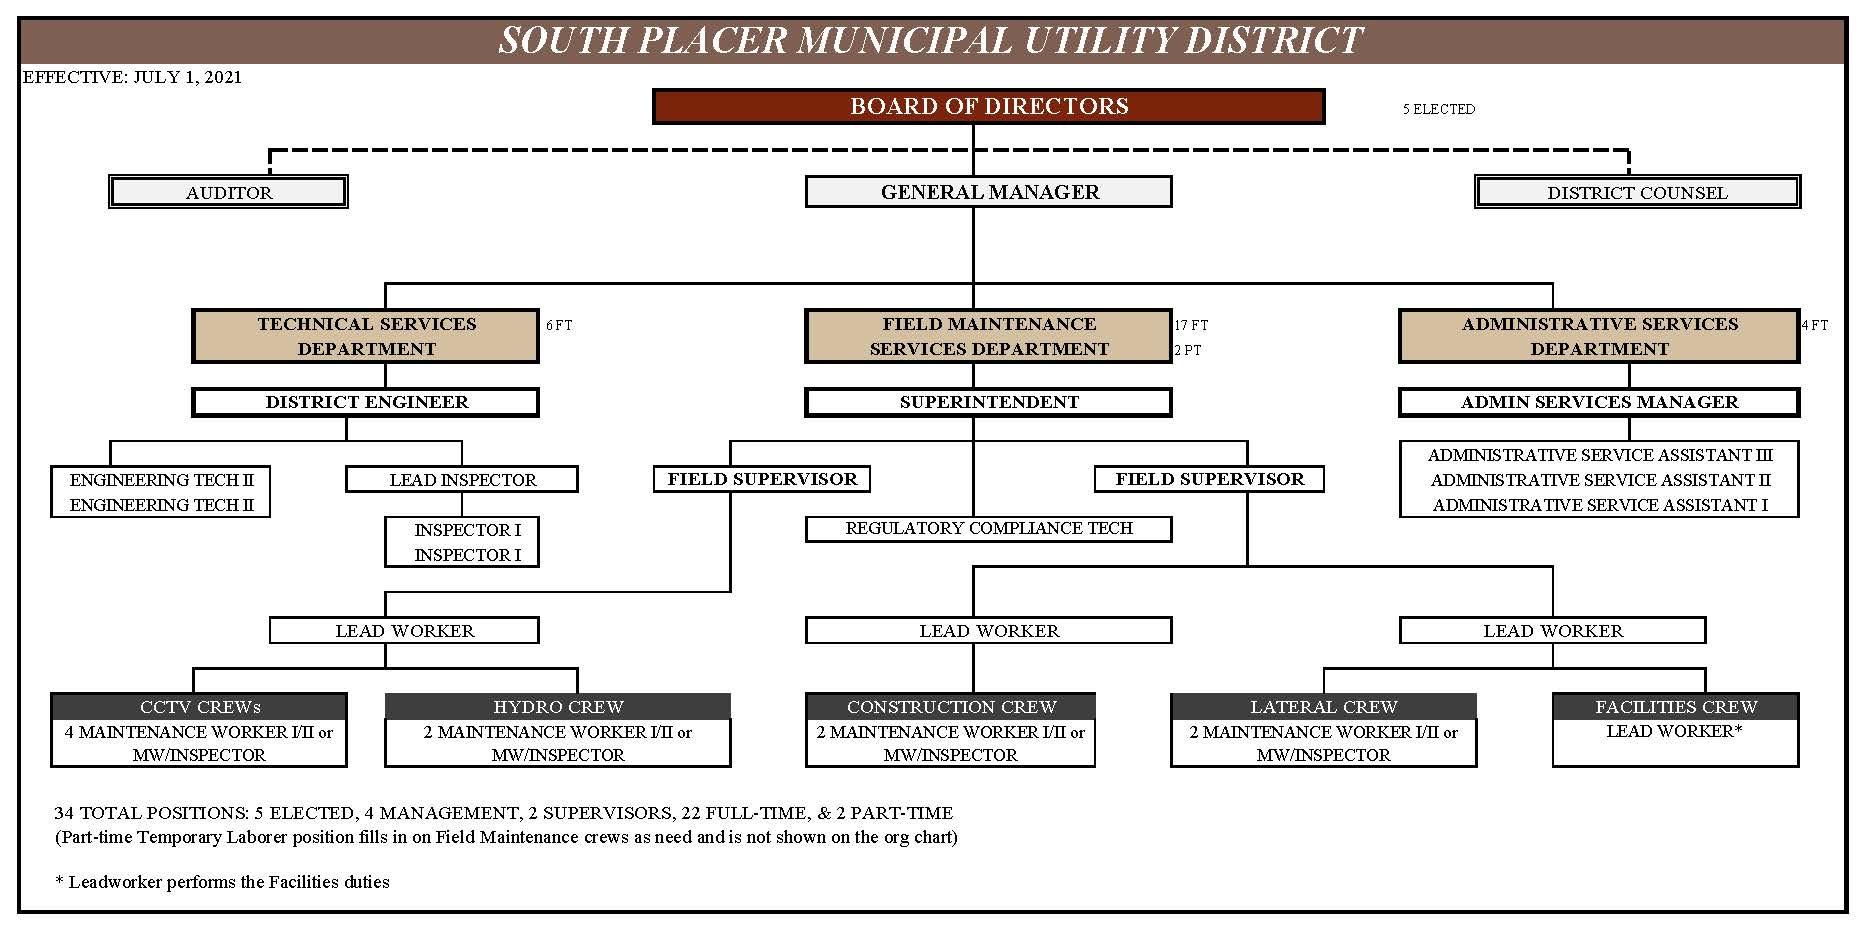 Fiscal 21/22 Organizational Chart